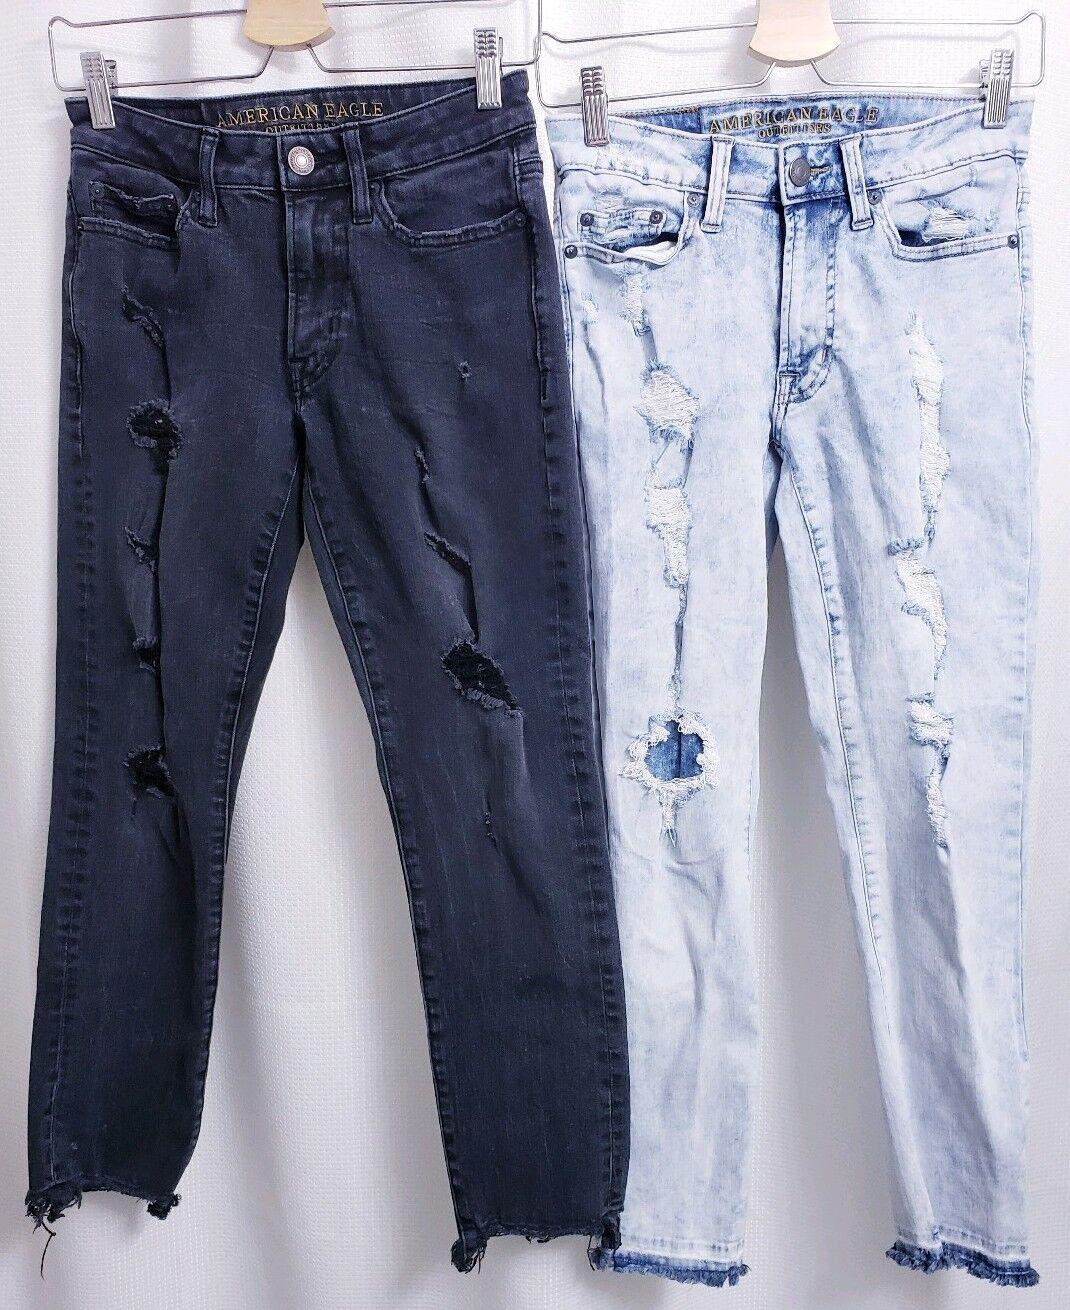 Lot of 2 American Eagle Slim Extreme Flex Destroyed Jeans sz 26x28 Men's Raw Hem